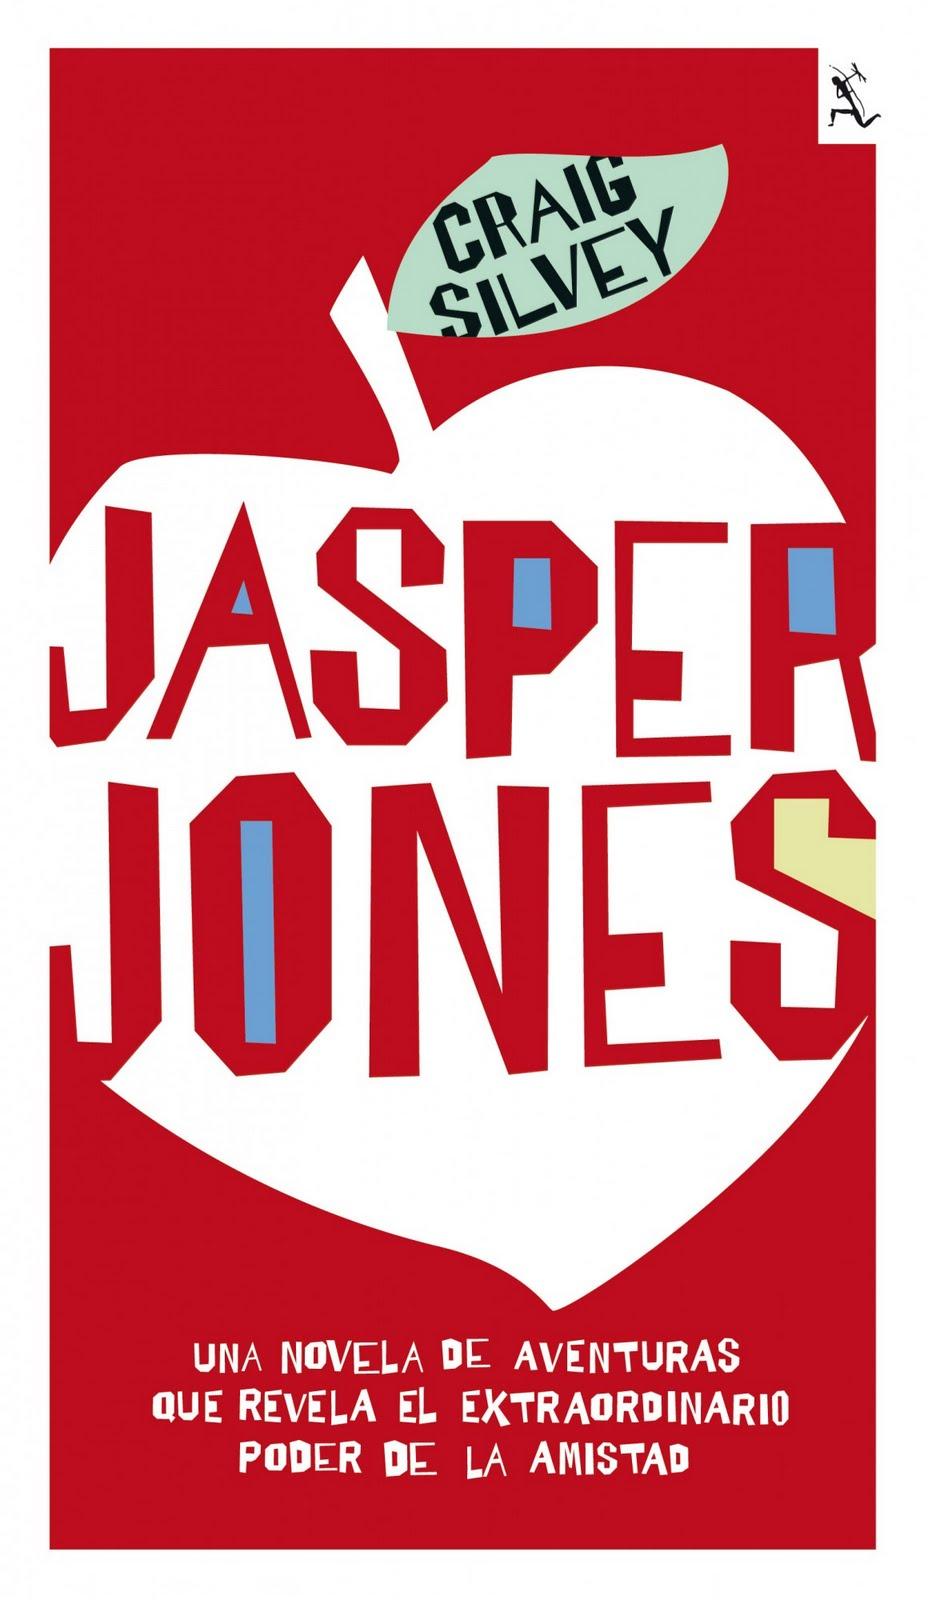 jasper jones by craig silvey 2 essay Jasper jones by craig silvey posted on  development of the protagonist of jasper jones then write a well-organized essay that analyzes how that single moment .